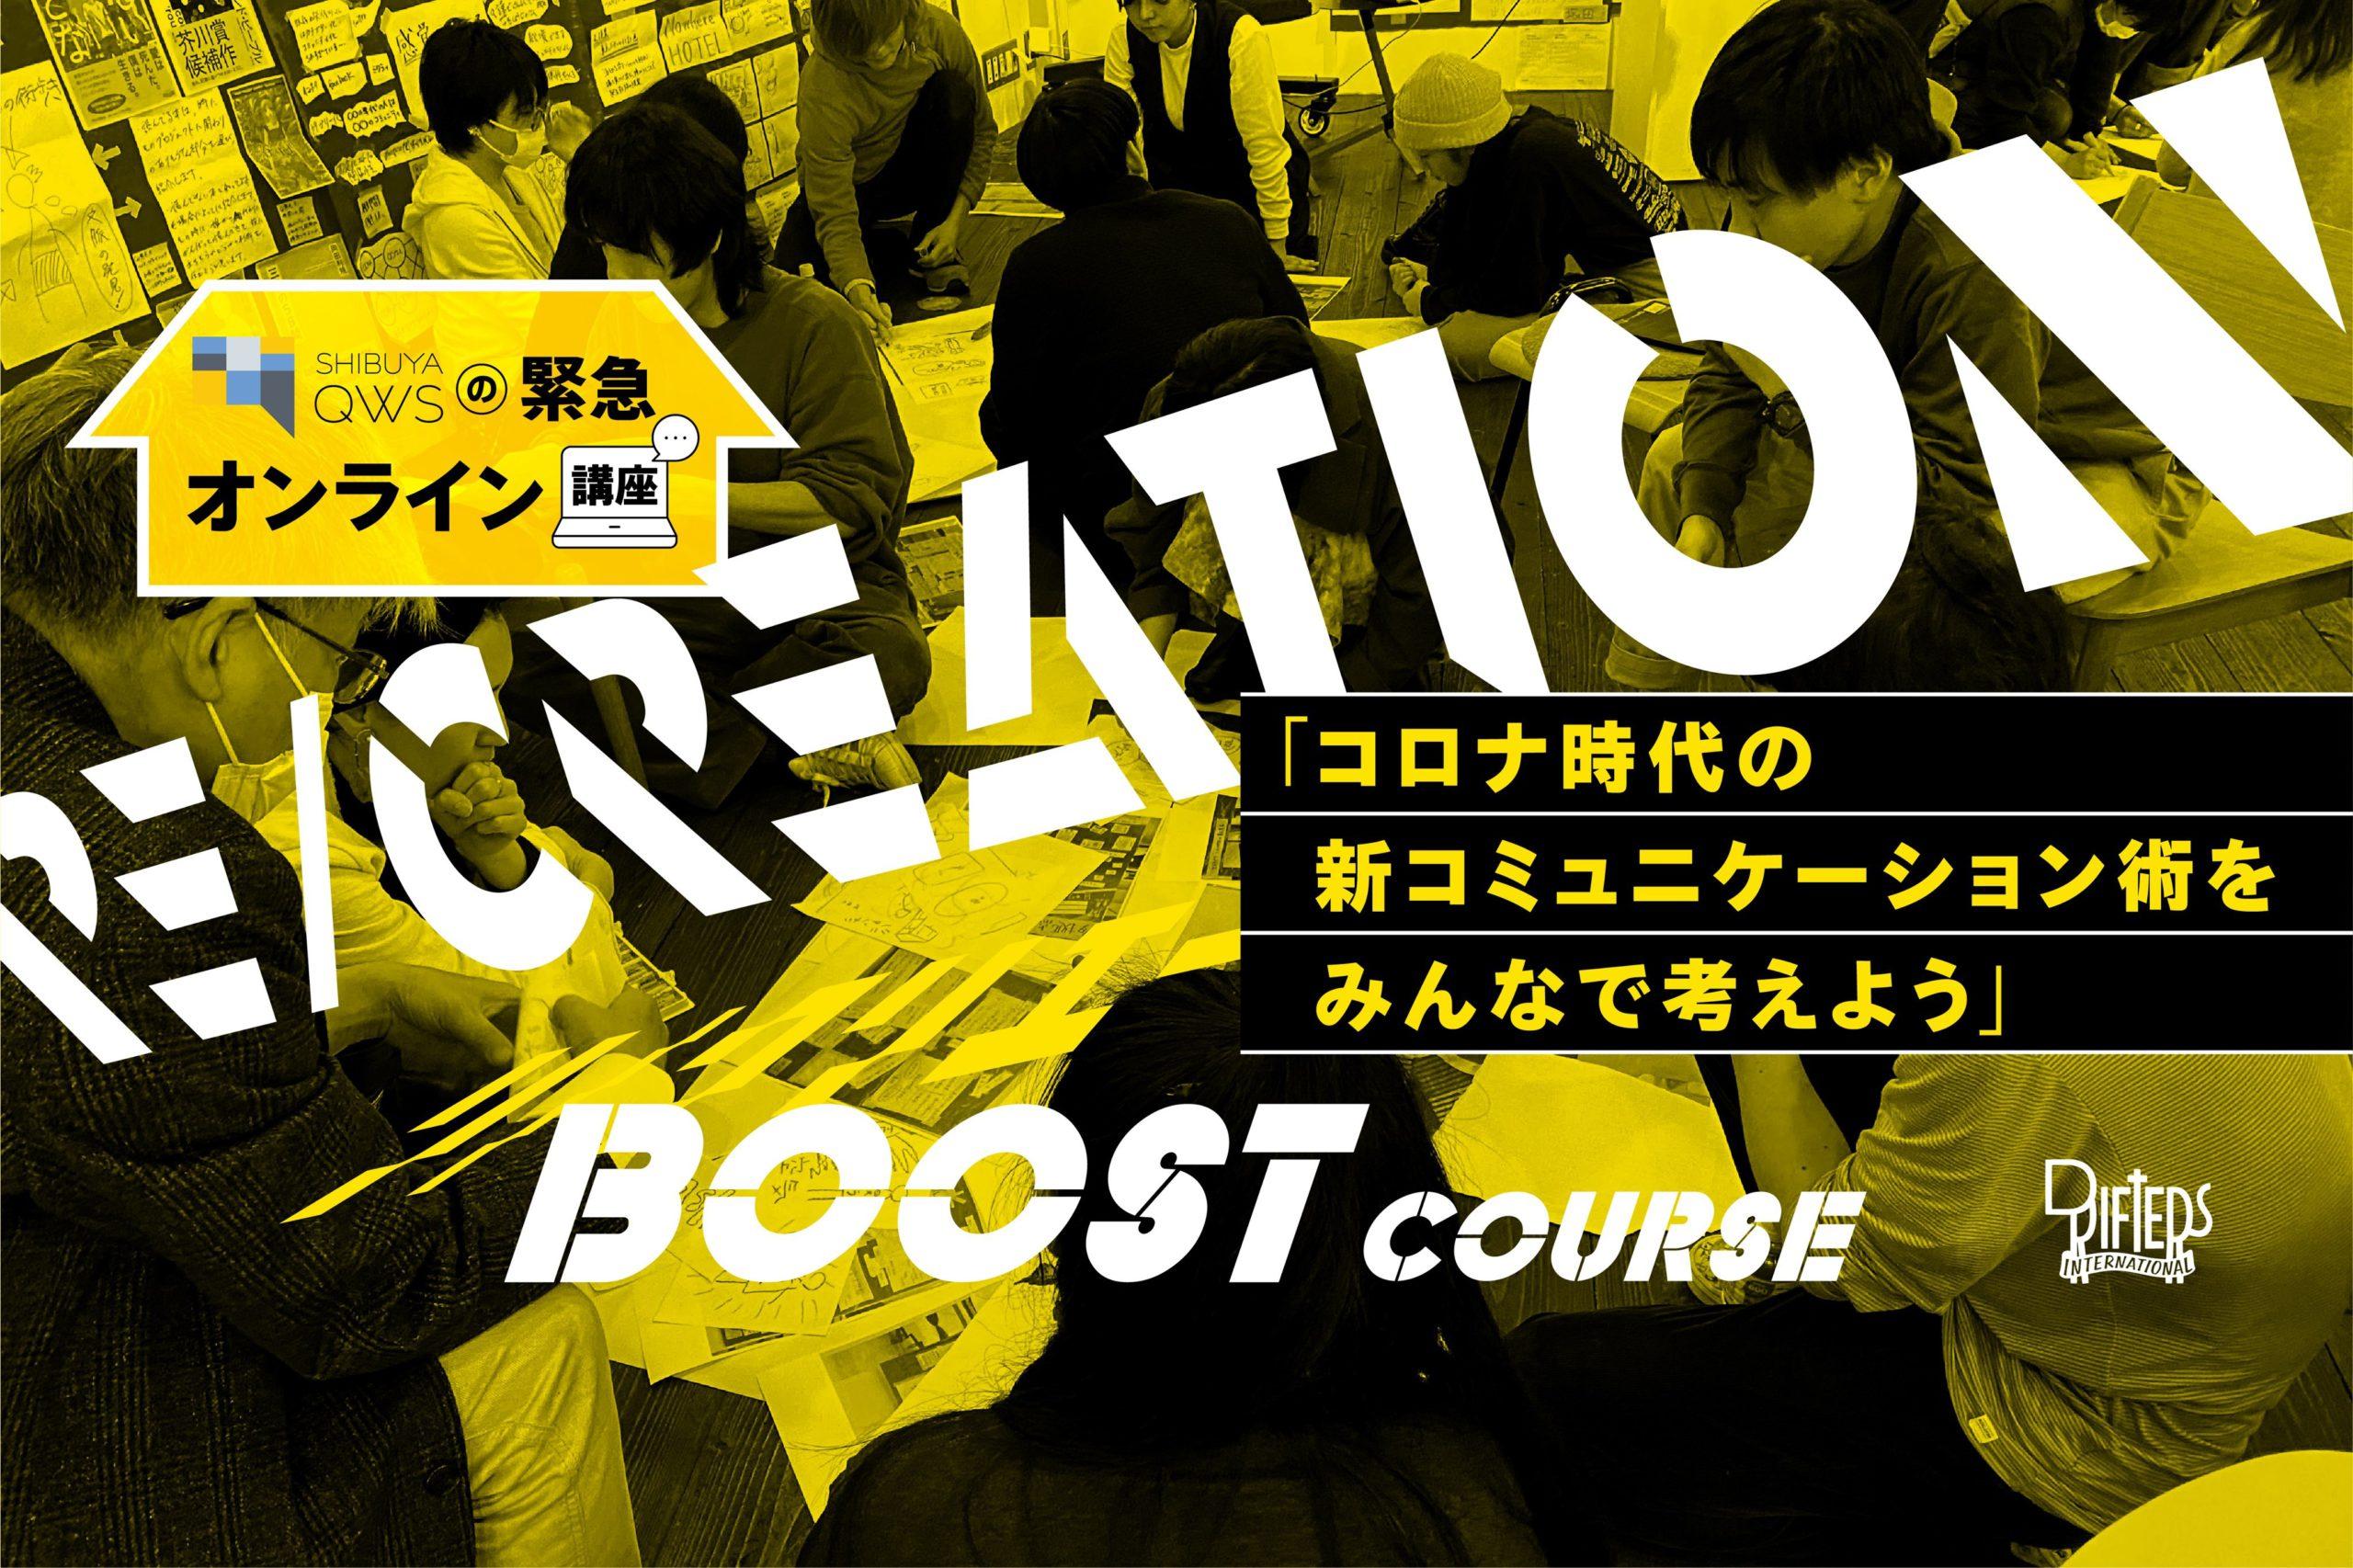 QWSの緊急オンライン講座「RE/CREATION」BOOSTコース